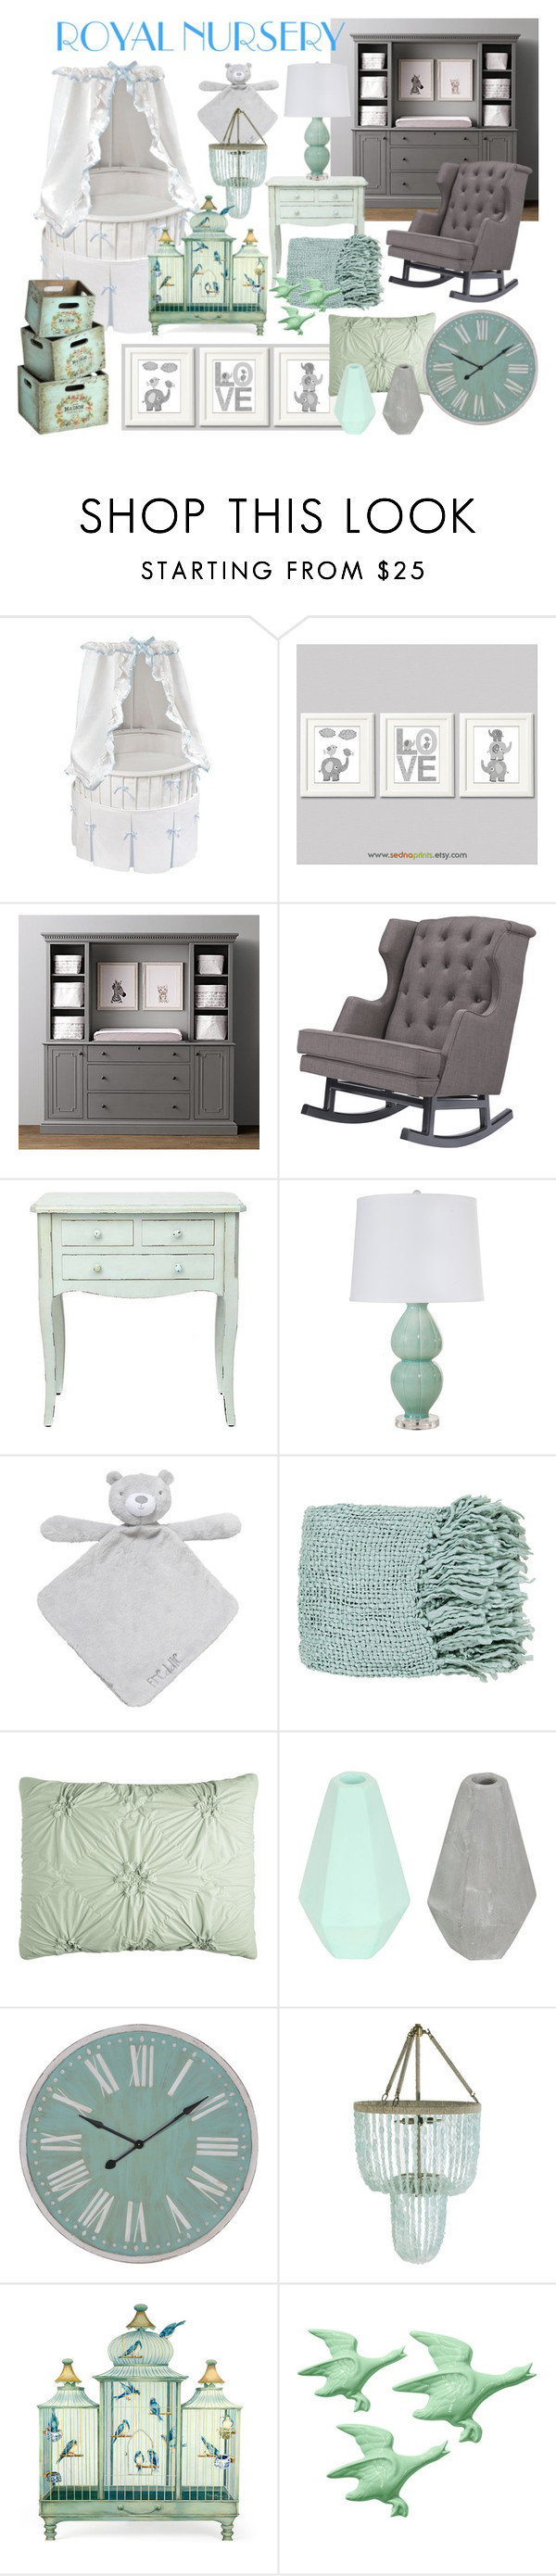 Home interior design royal royal nursery  dreams by stylebycharlene on polyvore featuring